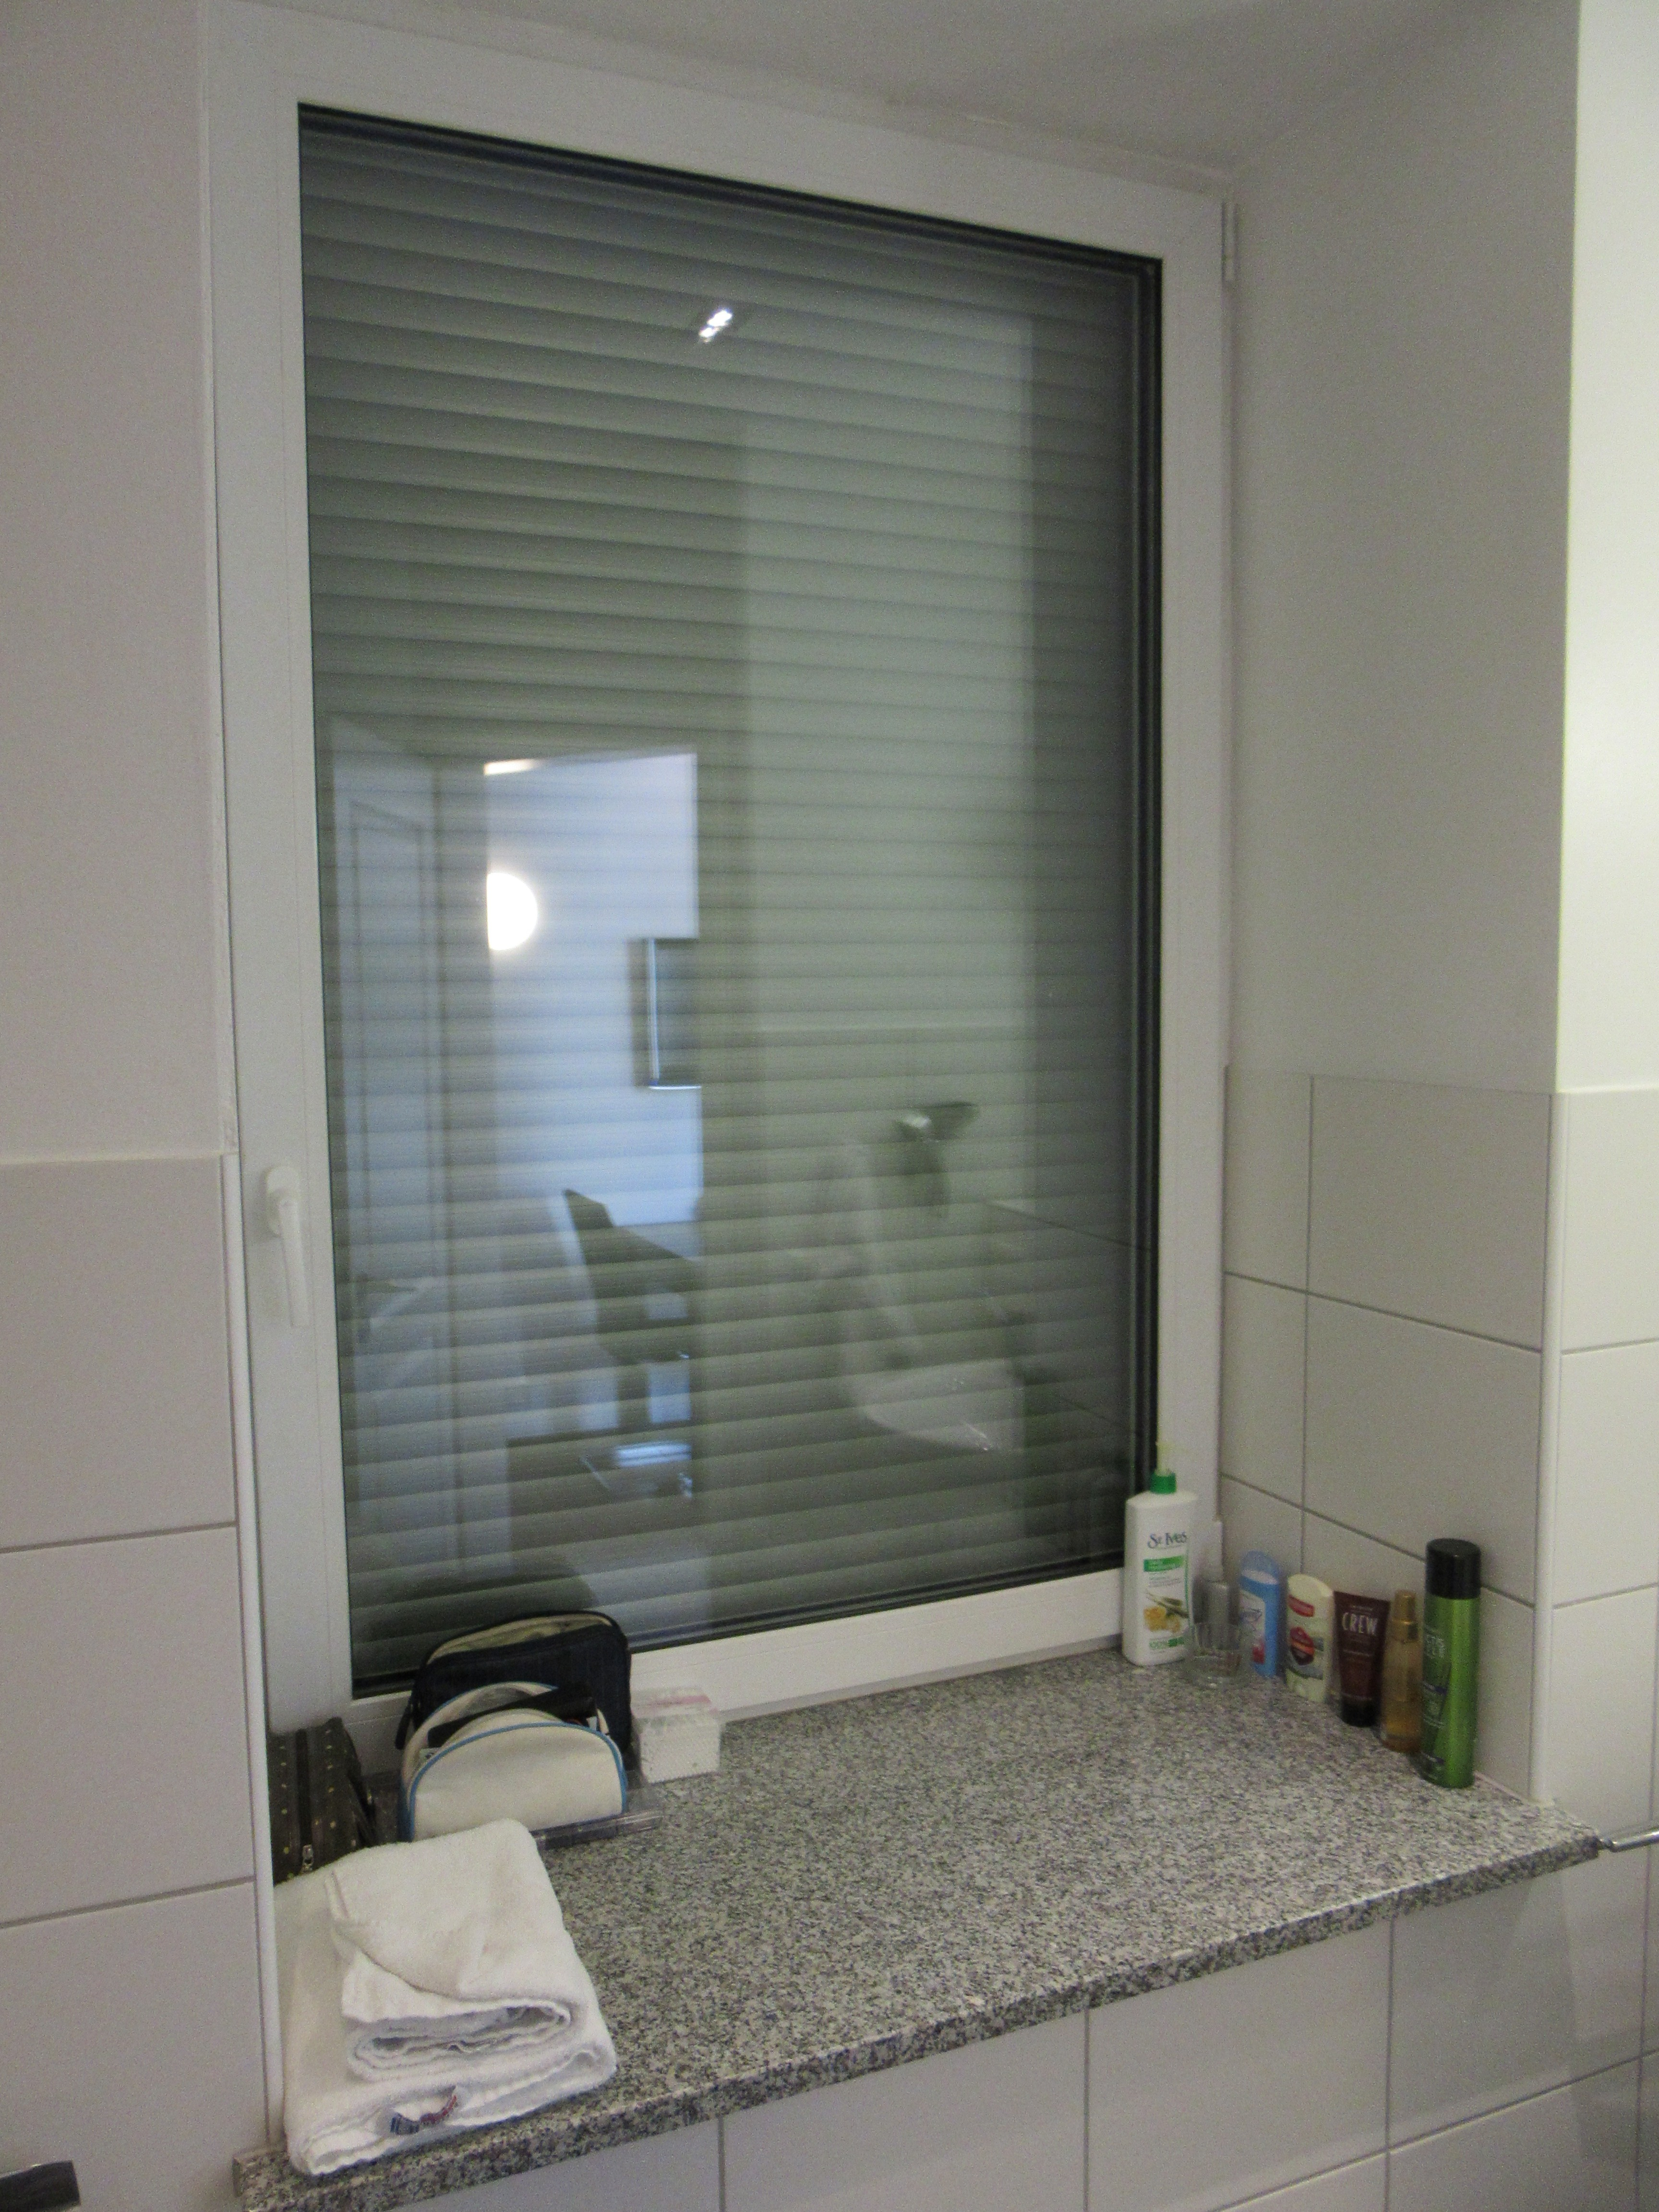 windows shutters bathroom window gratograt photos new best blinds july pictures of